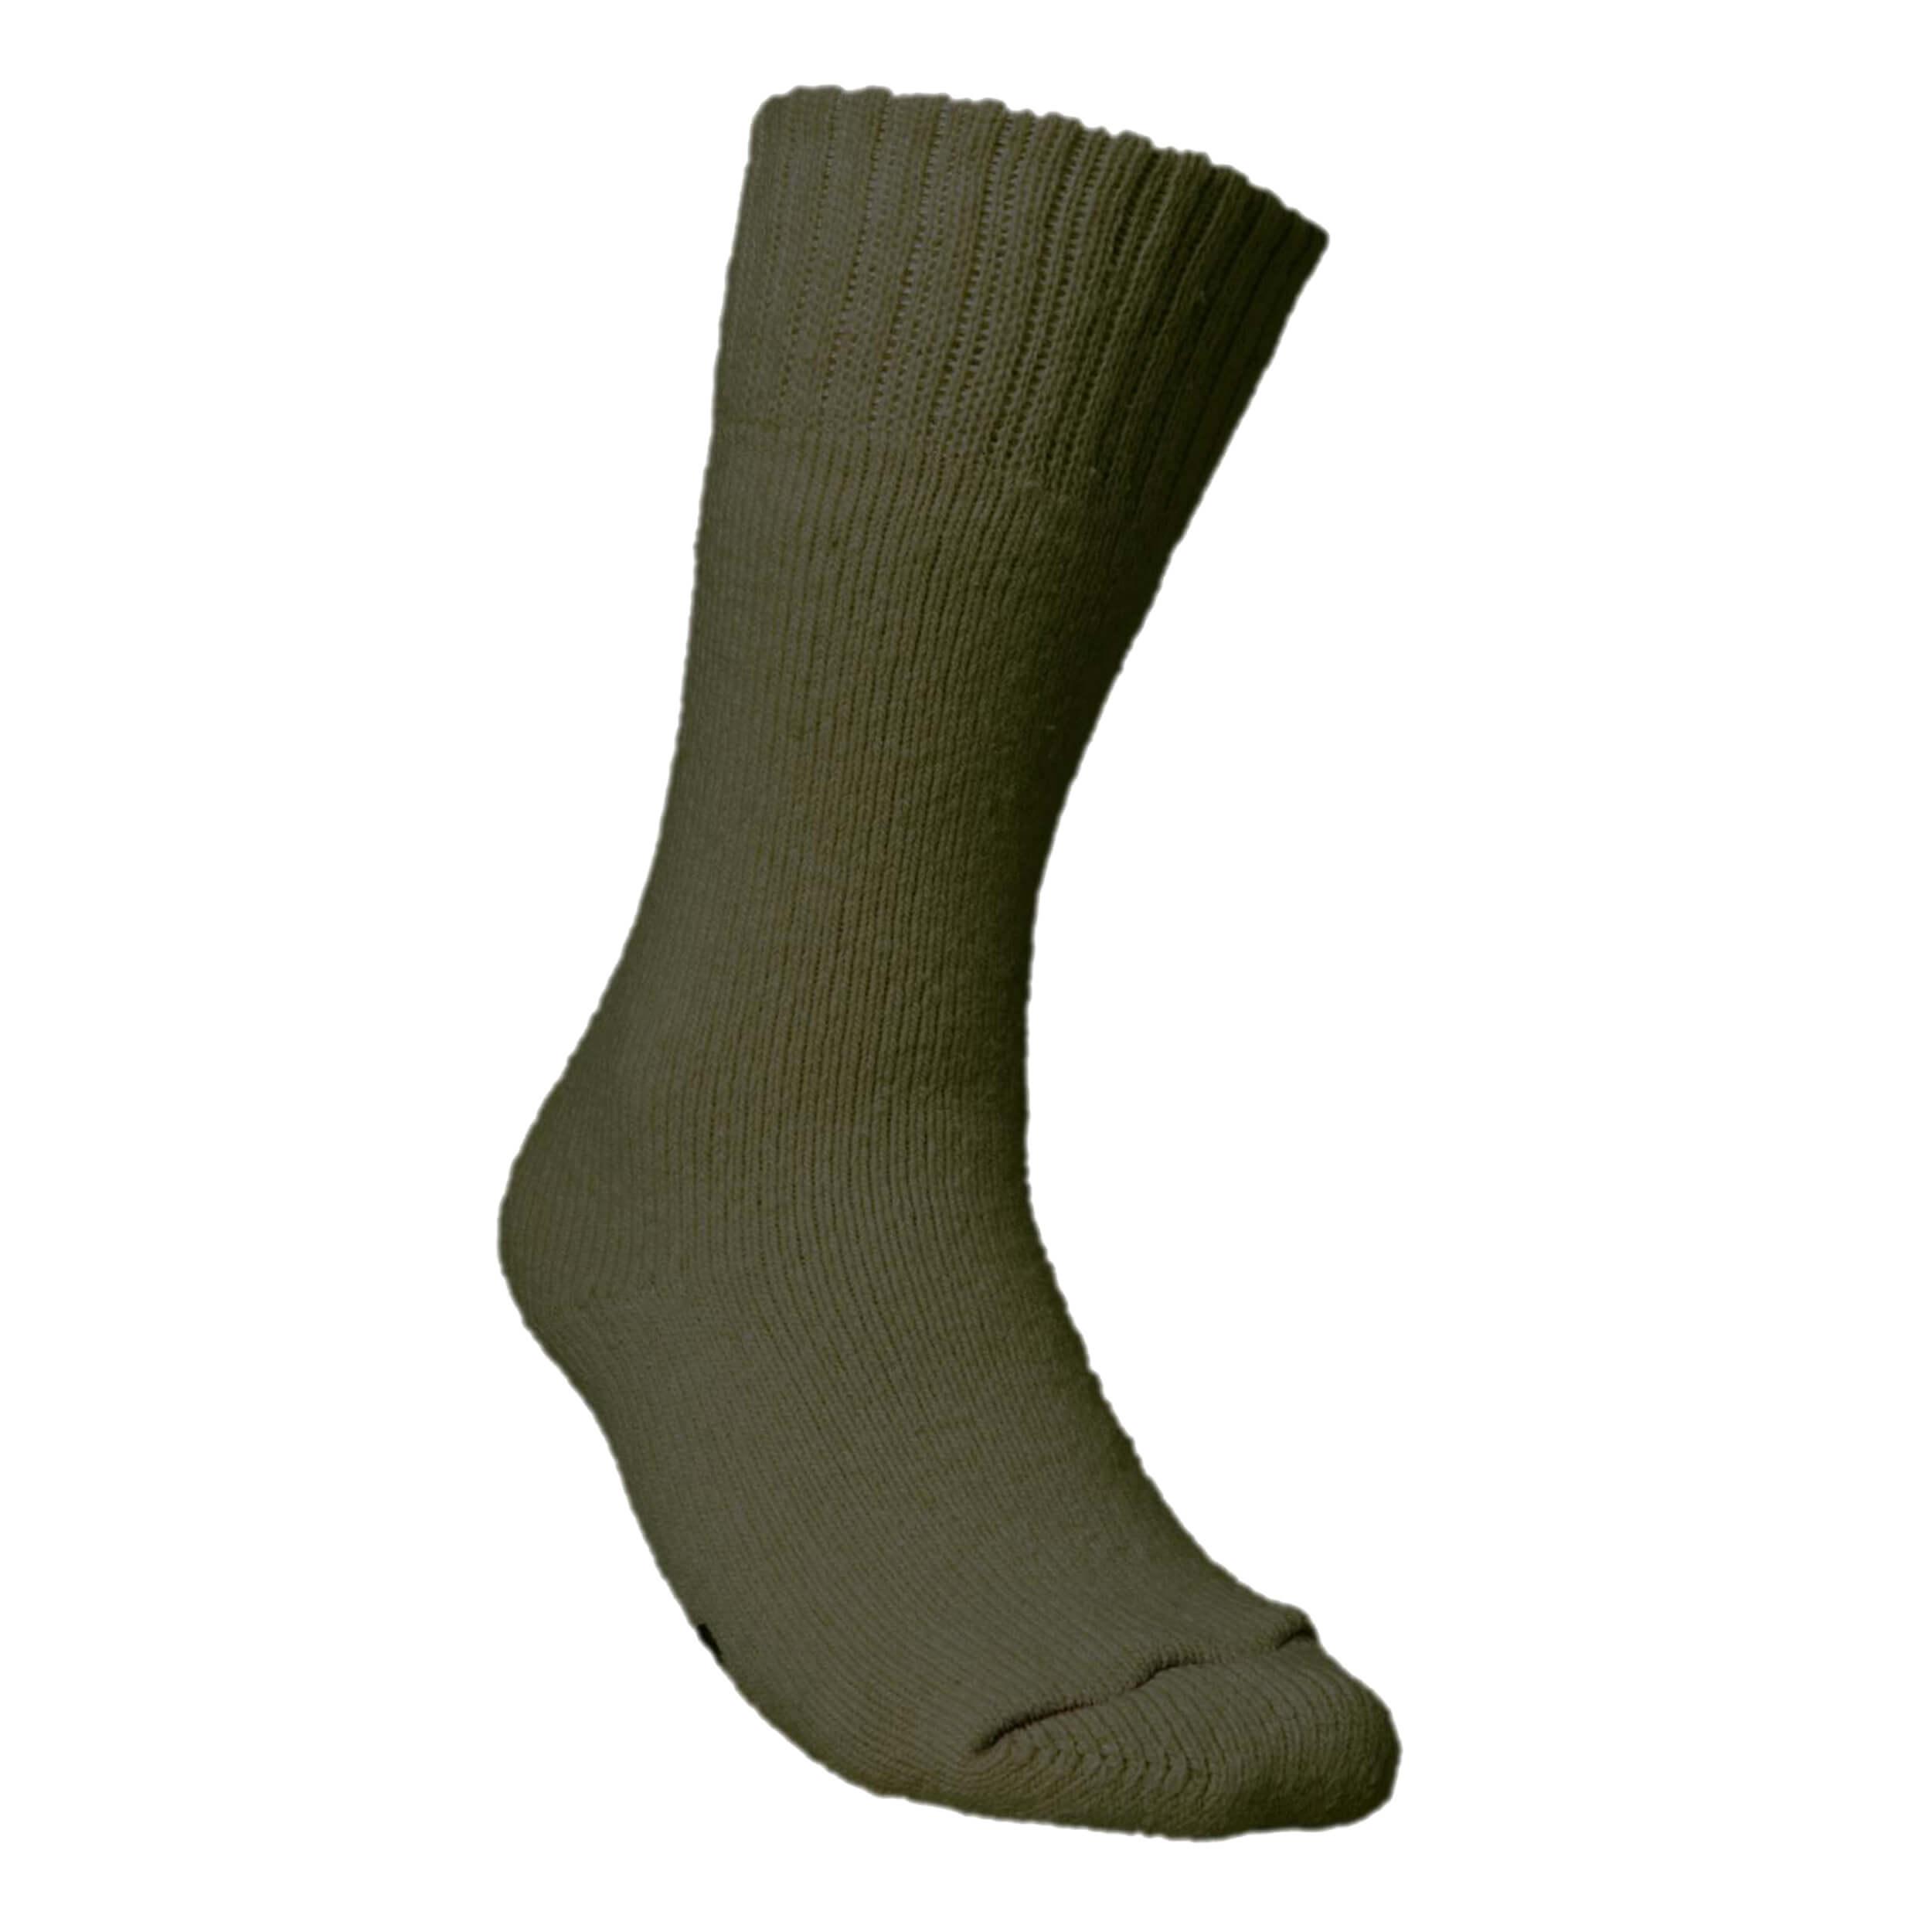 Helikon-Tex Norwegian Army Socken - Wolle - Olive Green